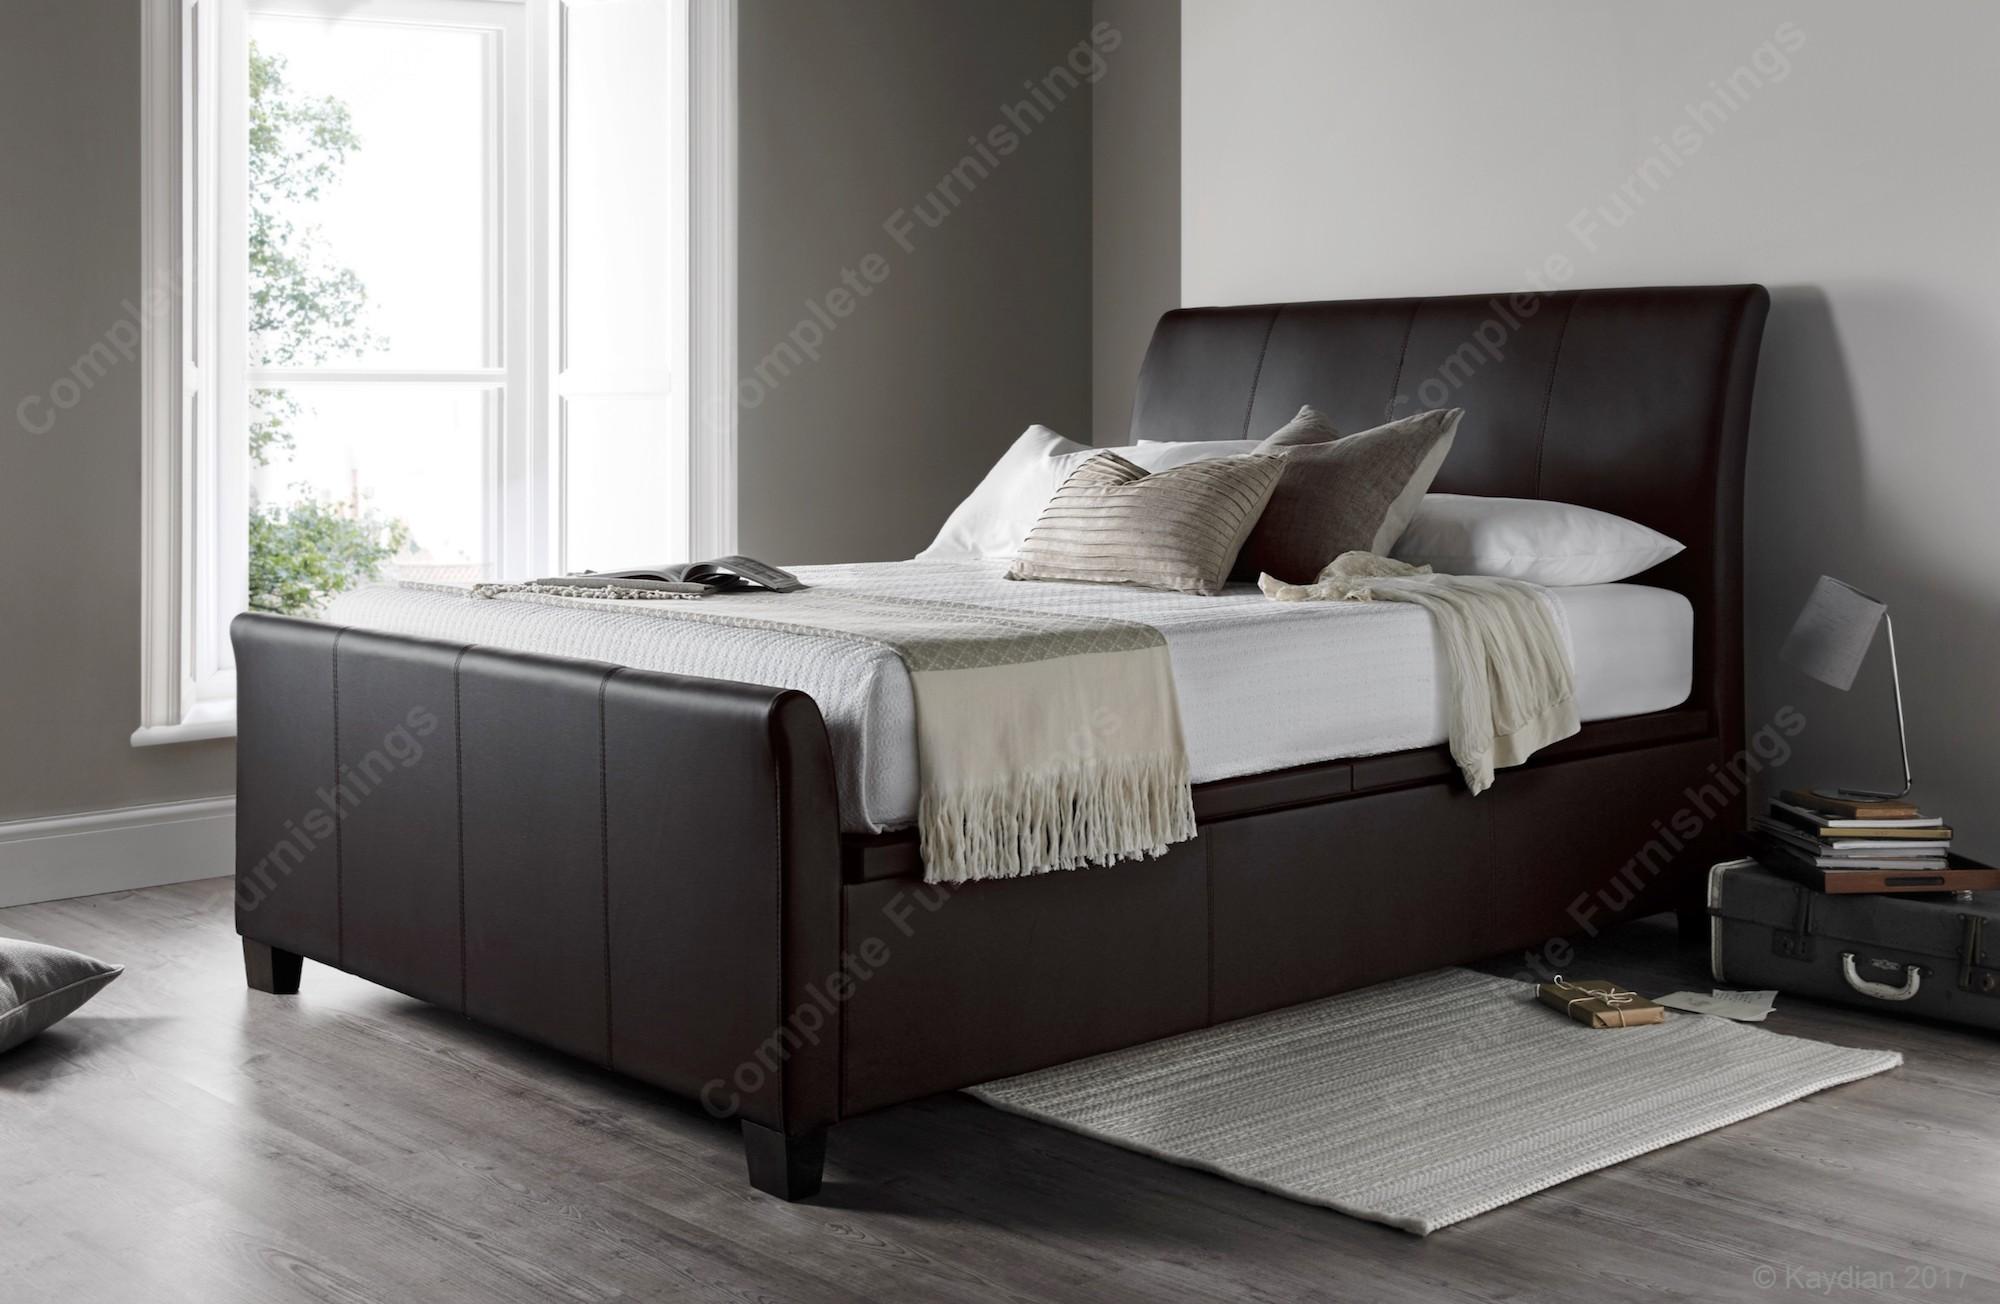 Best Price Ottoman Beds